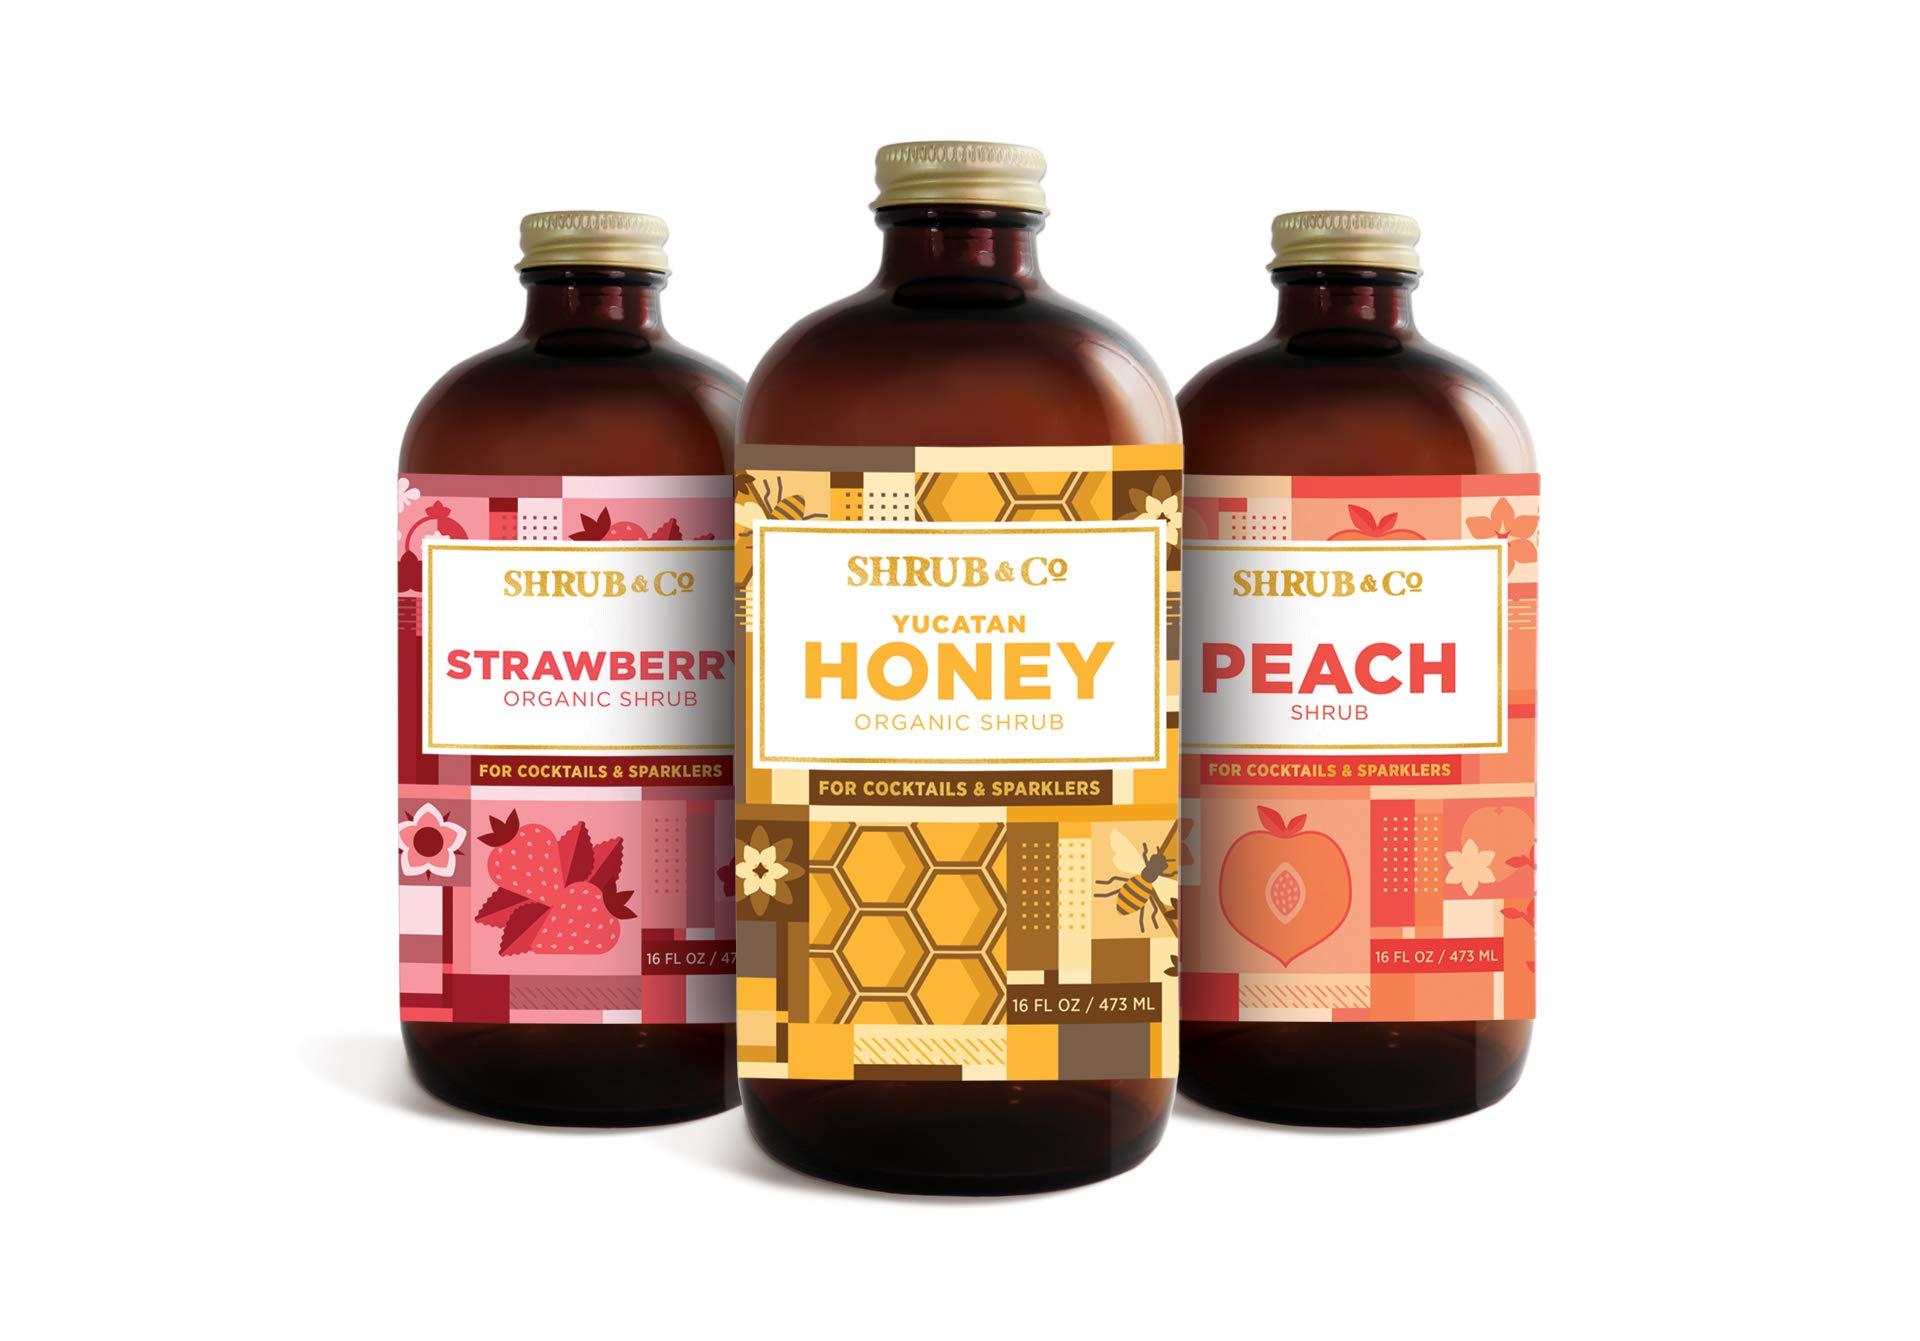 Shrub & Co Summer Expressions Shrub Trio; Organic Honey, Organic Strawberry, Peach Shrub - Fruit-Driven Mixers for Cocktails, Sparklers, and Club Sodas, 16 fl. oz.